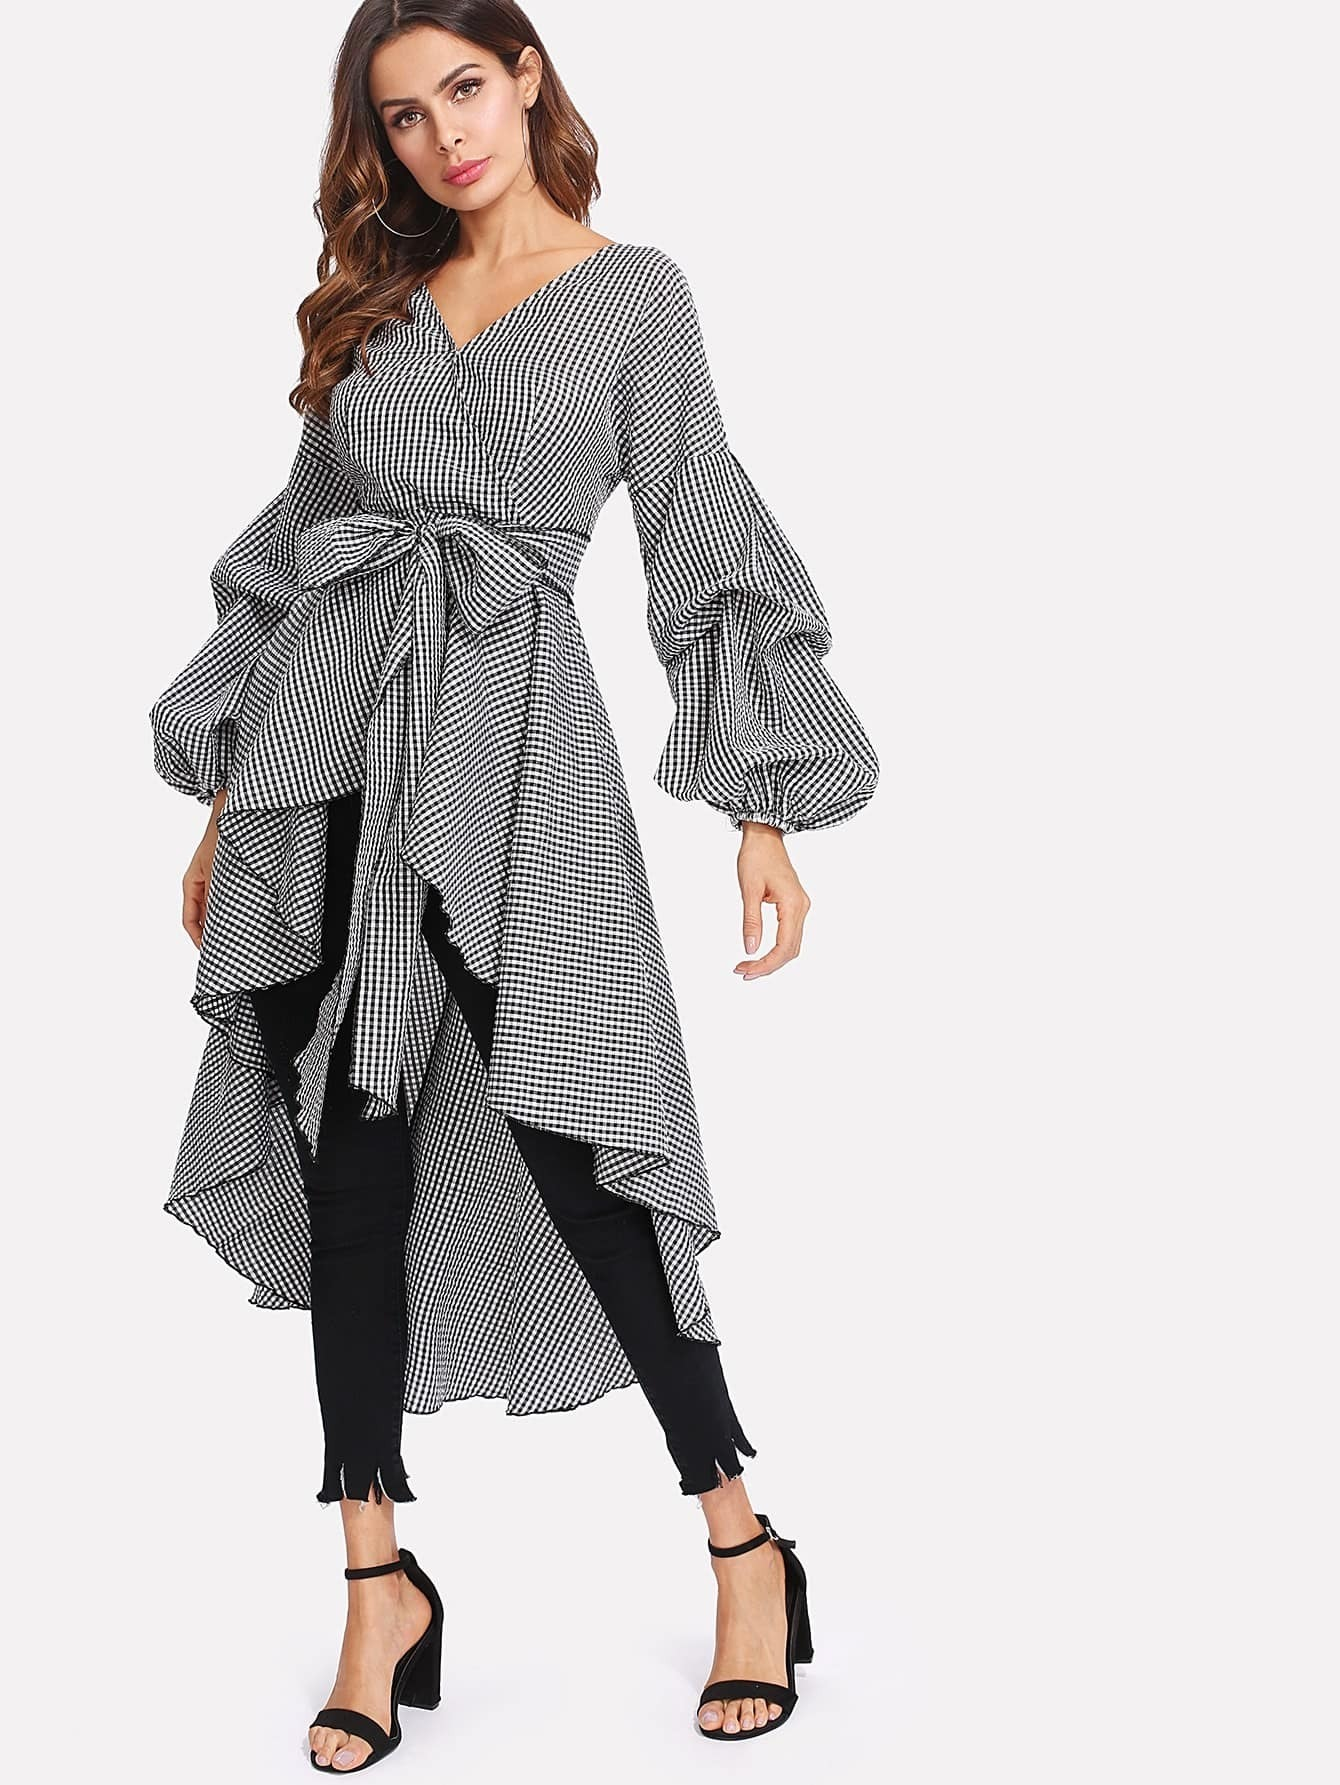 Gathered Sleeve Curved Dip Hem Gingham Dress gathered sleeve curved dip hem gingham dress